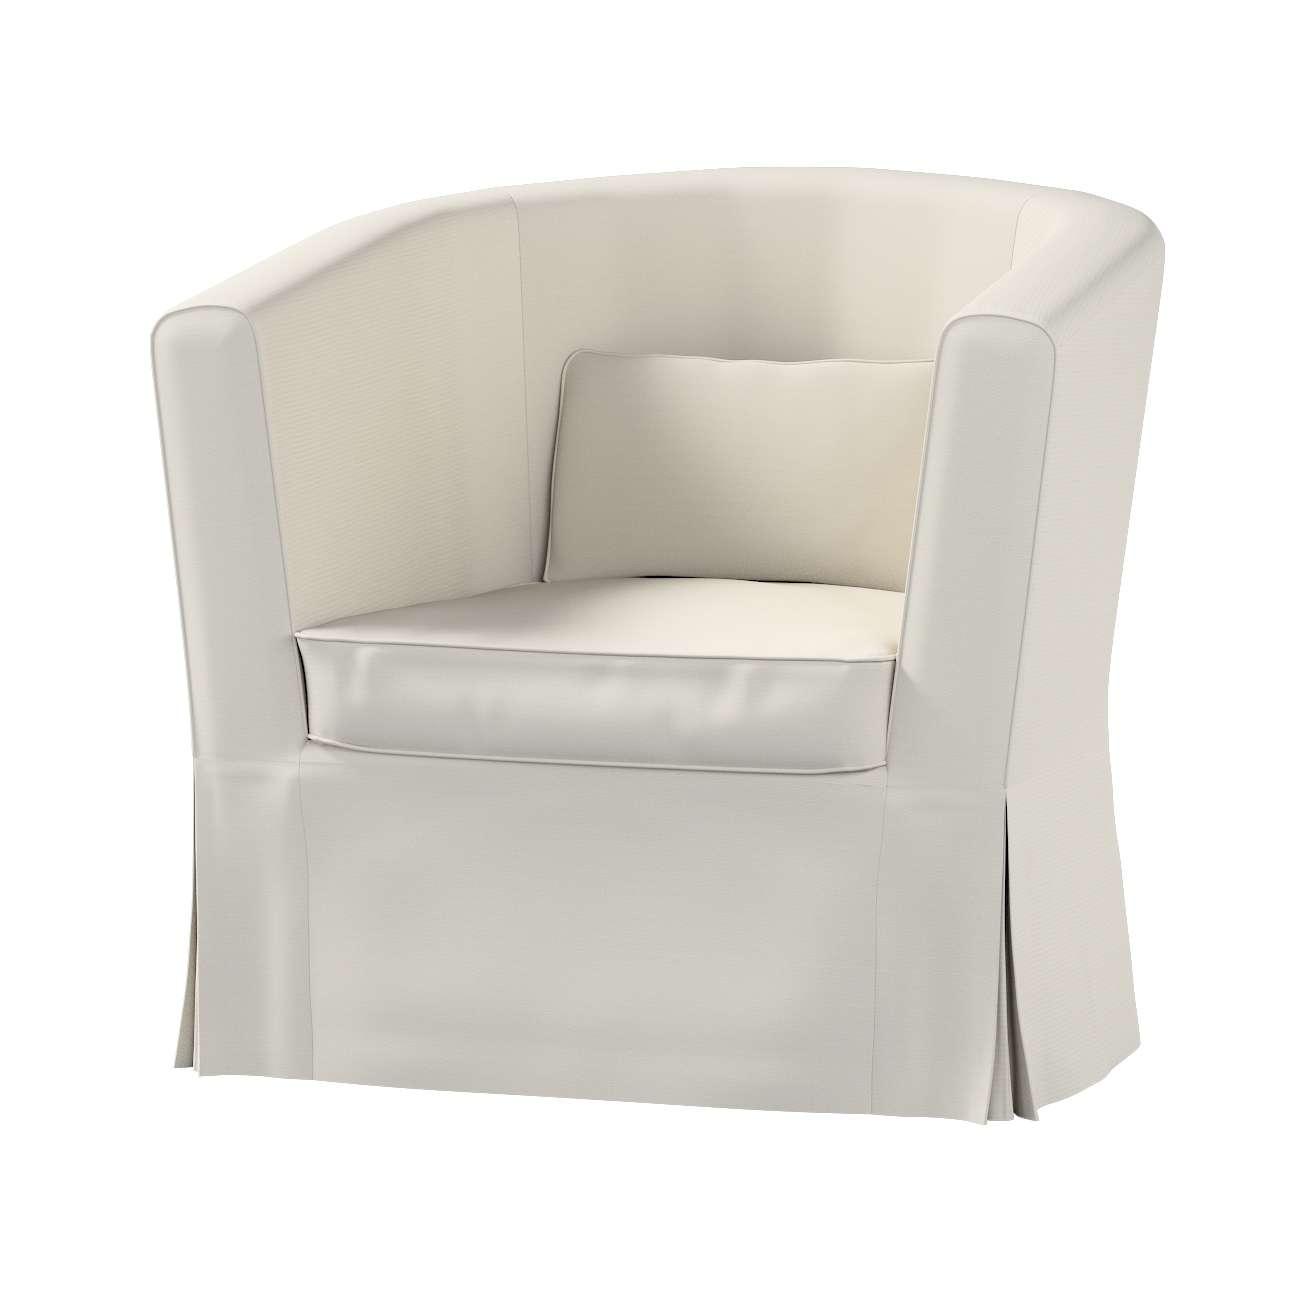 Ektorp Tullsta Sesselbezug Sesselhusse, Ektorp Tullsta von der Kollektion Cotton Panama, Stoff: 702-31